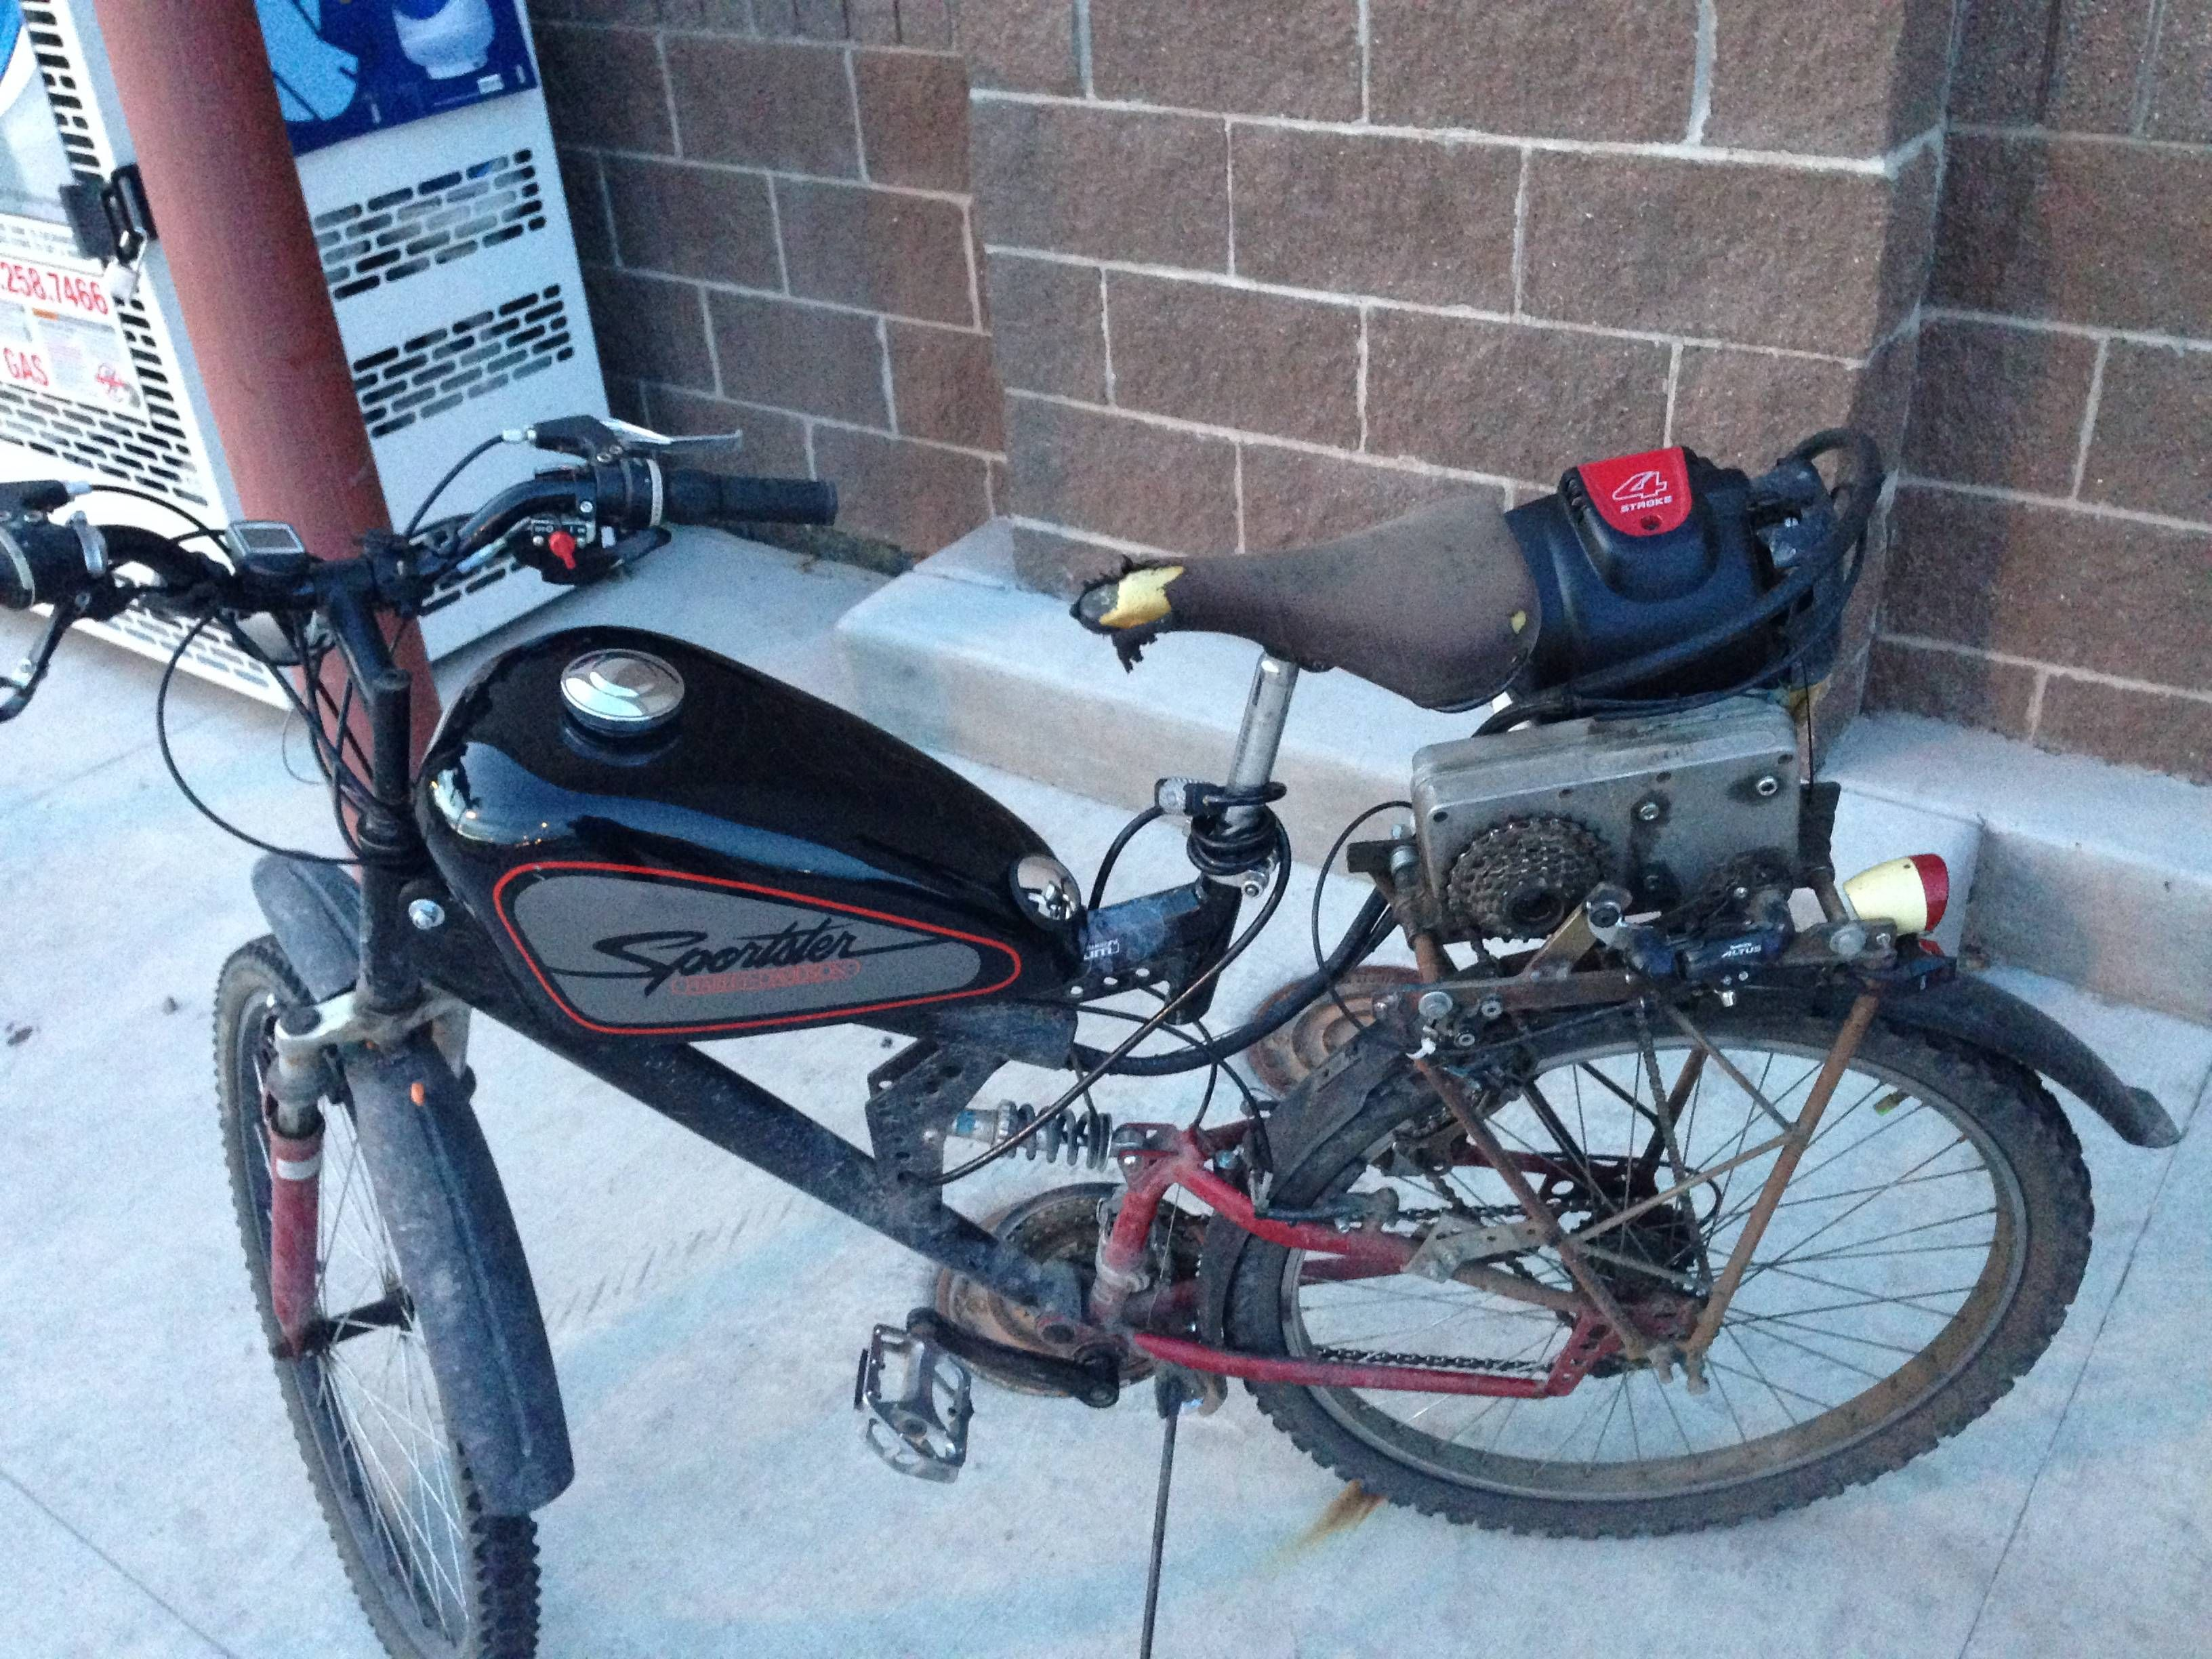 weed eater bmx bike - Google Search